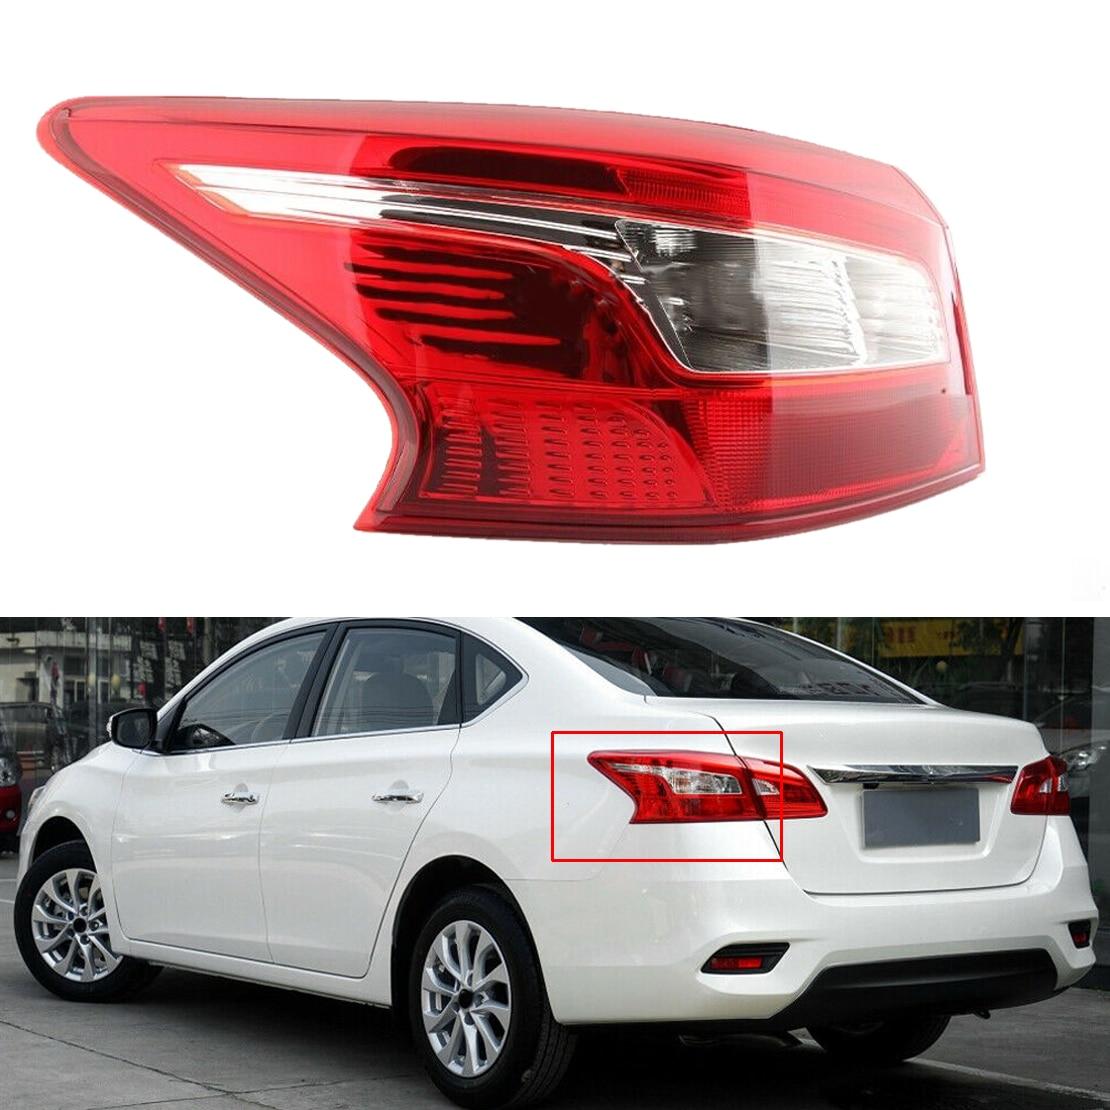 Carro esquerda exterior cauda luz traseira lâmpada de freio 45x19 cm apto para nissan sentra 2016 2017 2018